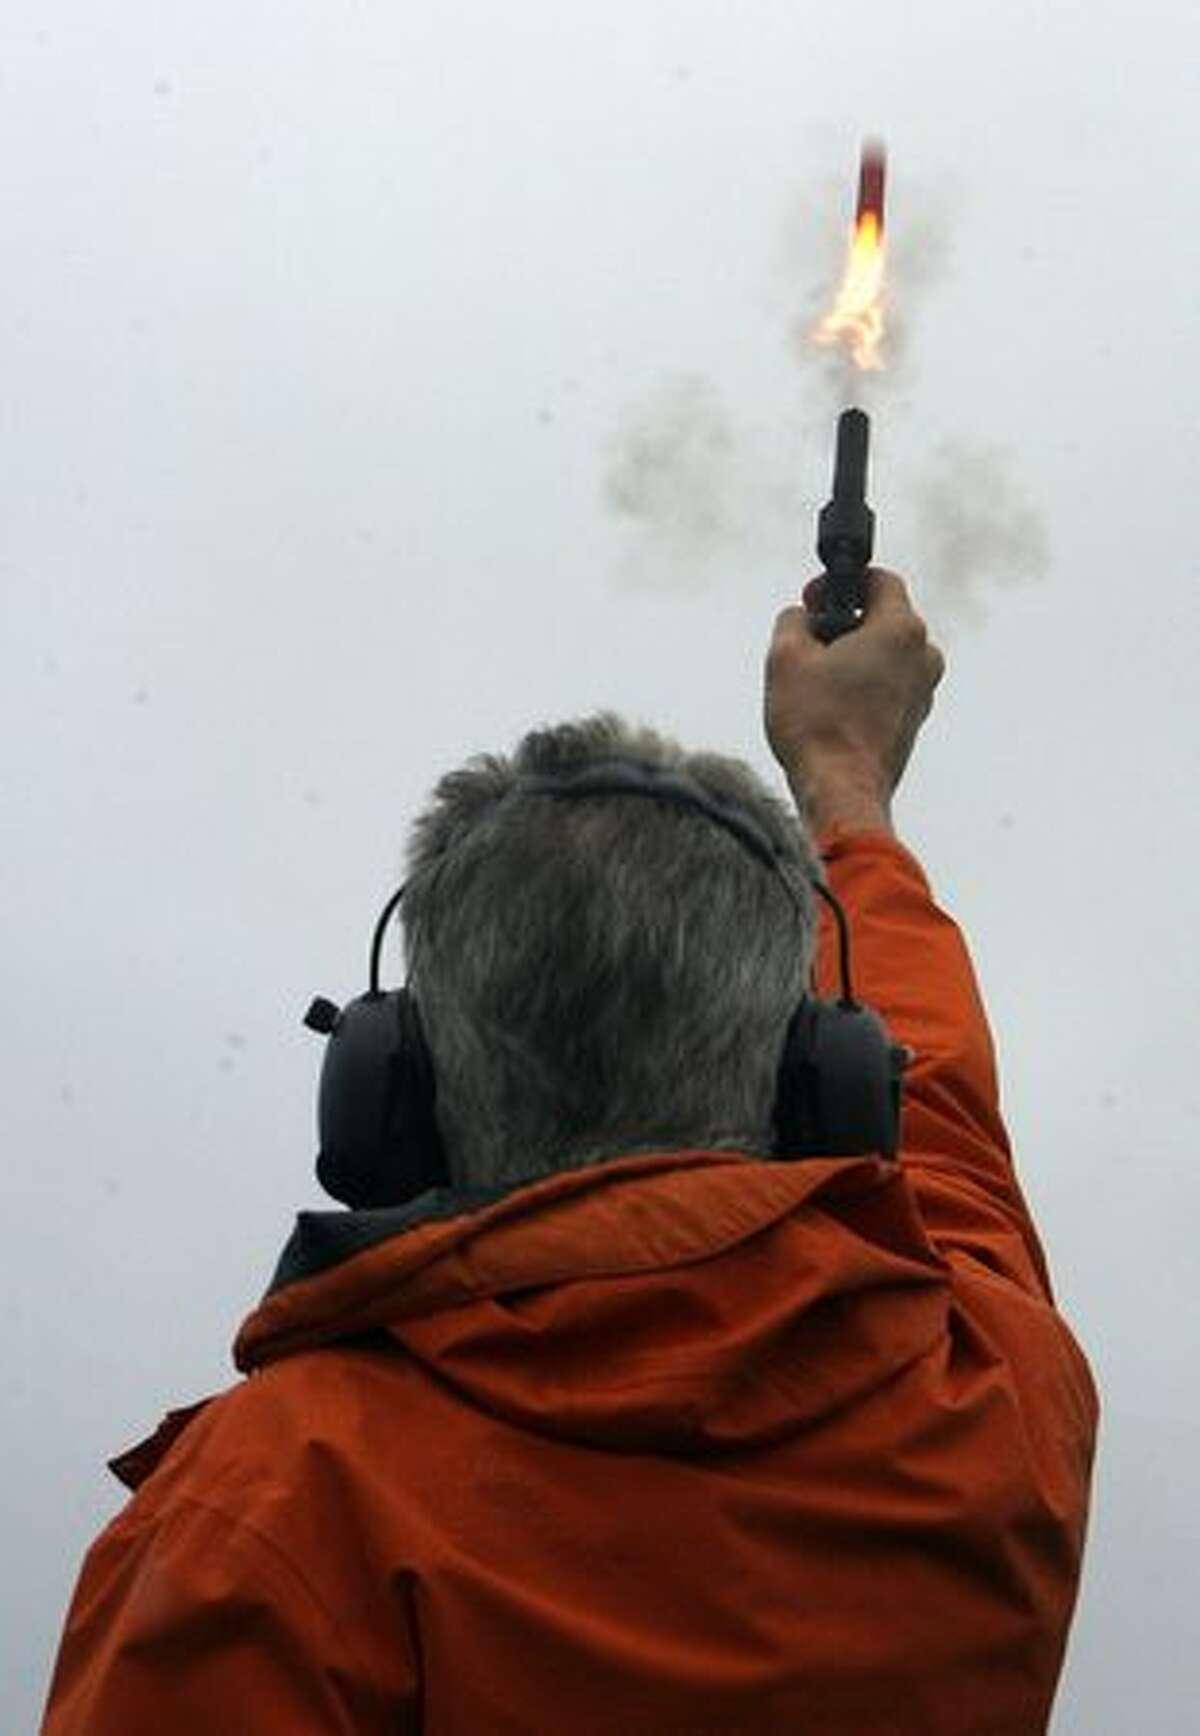 Seattle-Tacoma International Airport Senior Wildlife Biologist/Manager Steve Osmek demonstrates a bird-dispersing sound gun at the airport on Jan. 14, 2009.